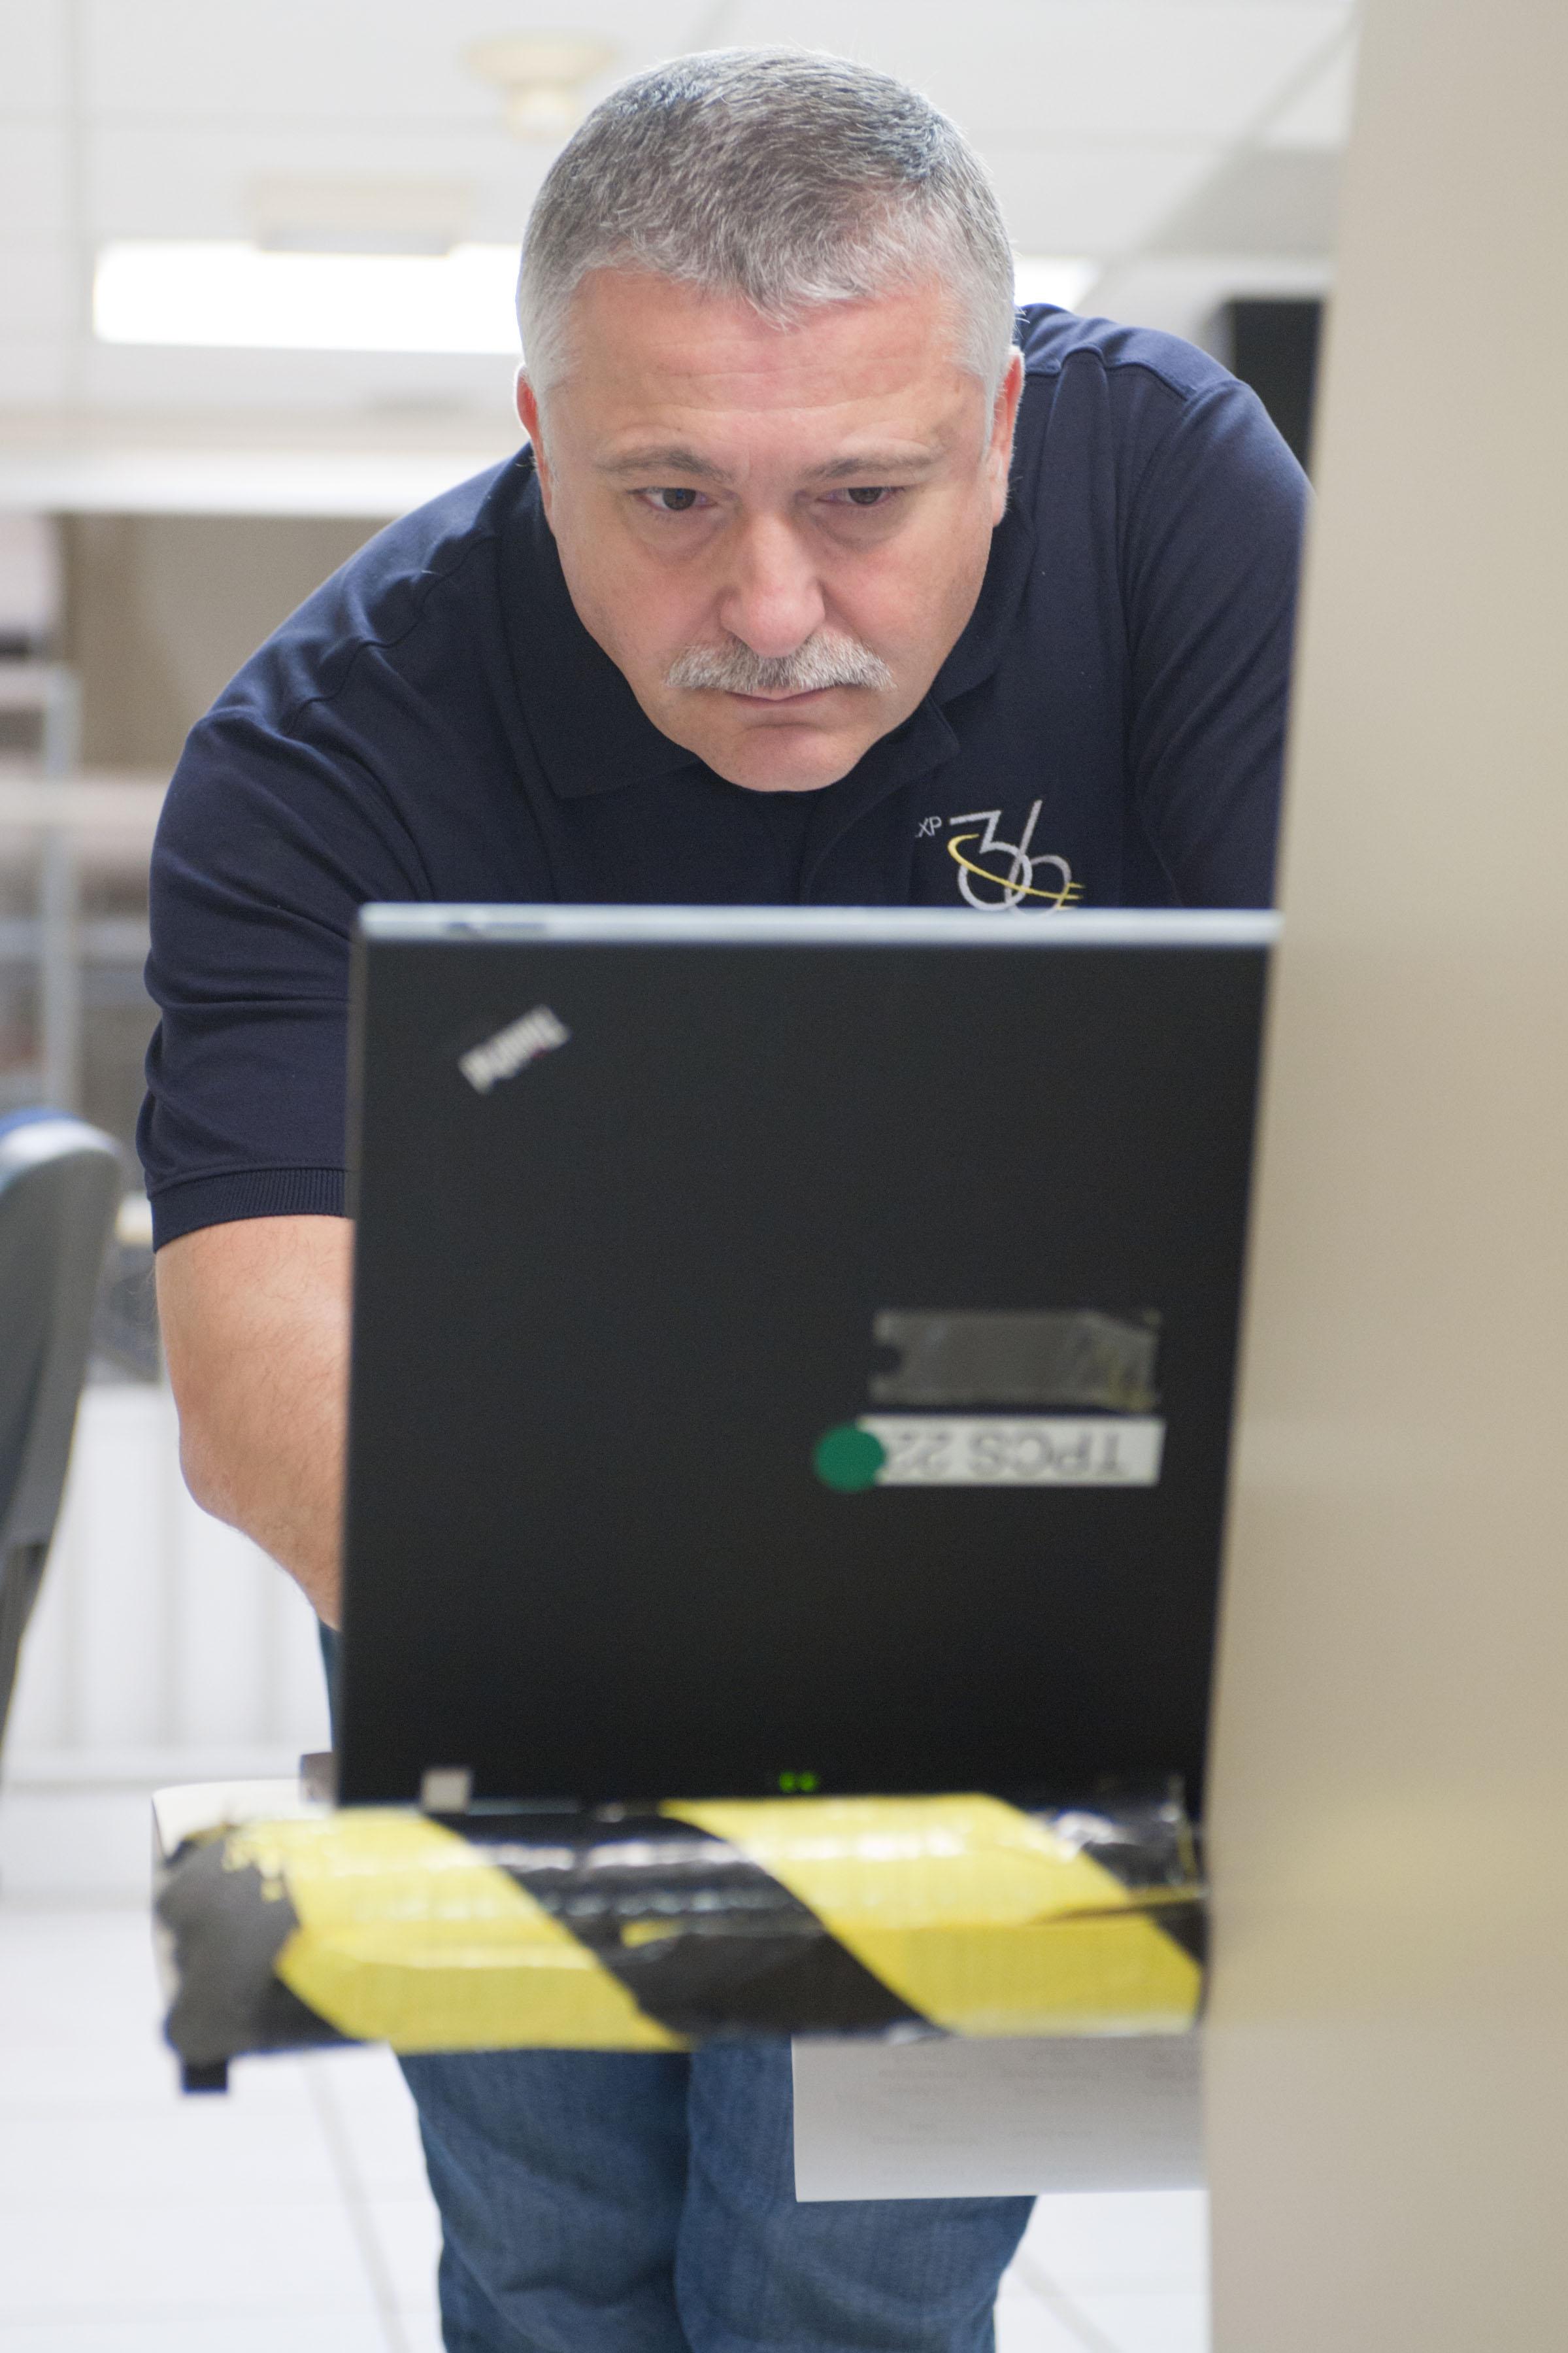 Fyodor Yurchikhin at Space Station Training Facility